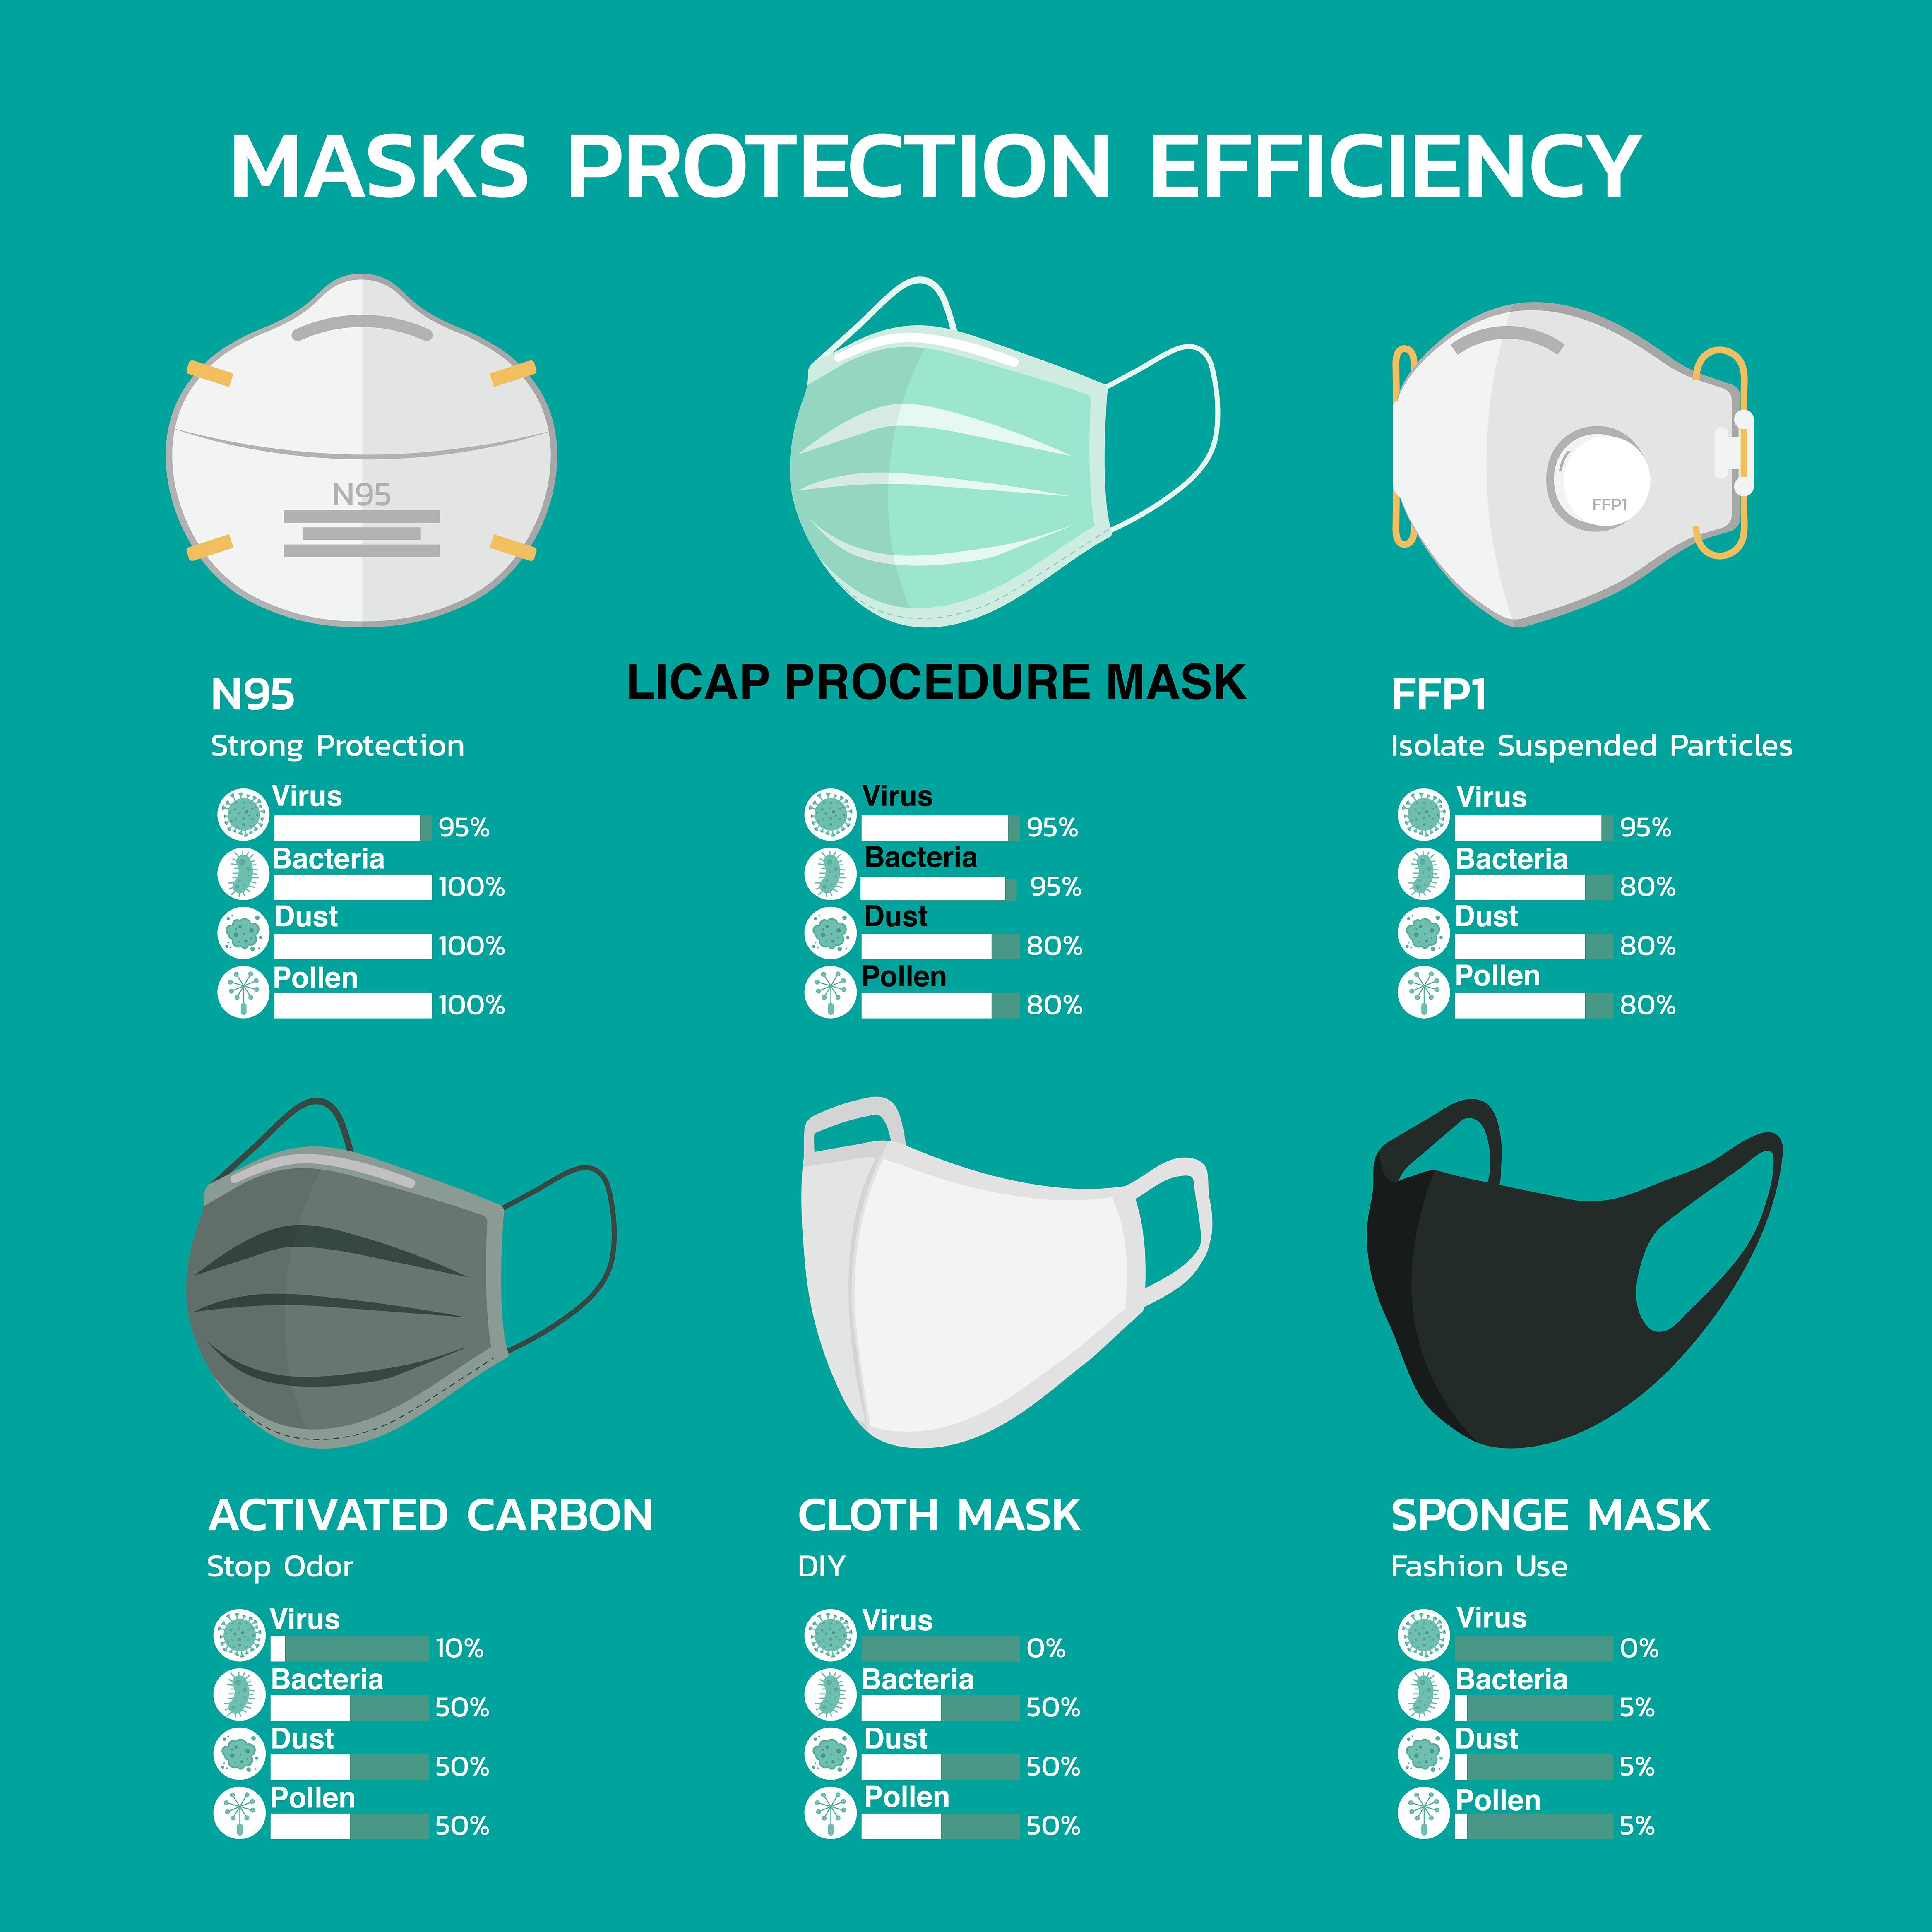 Protection or Fashion? di 2020 Infografis